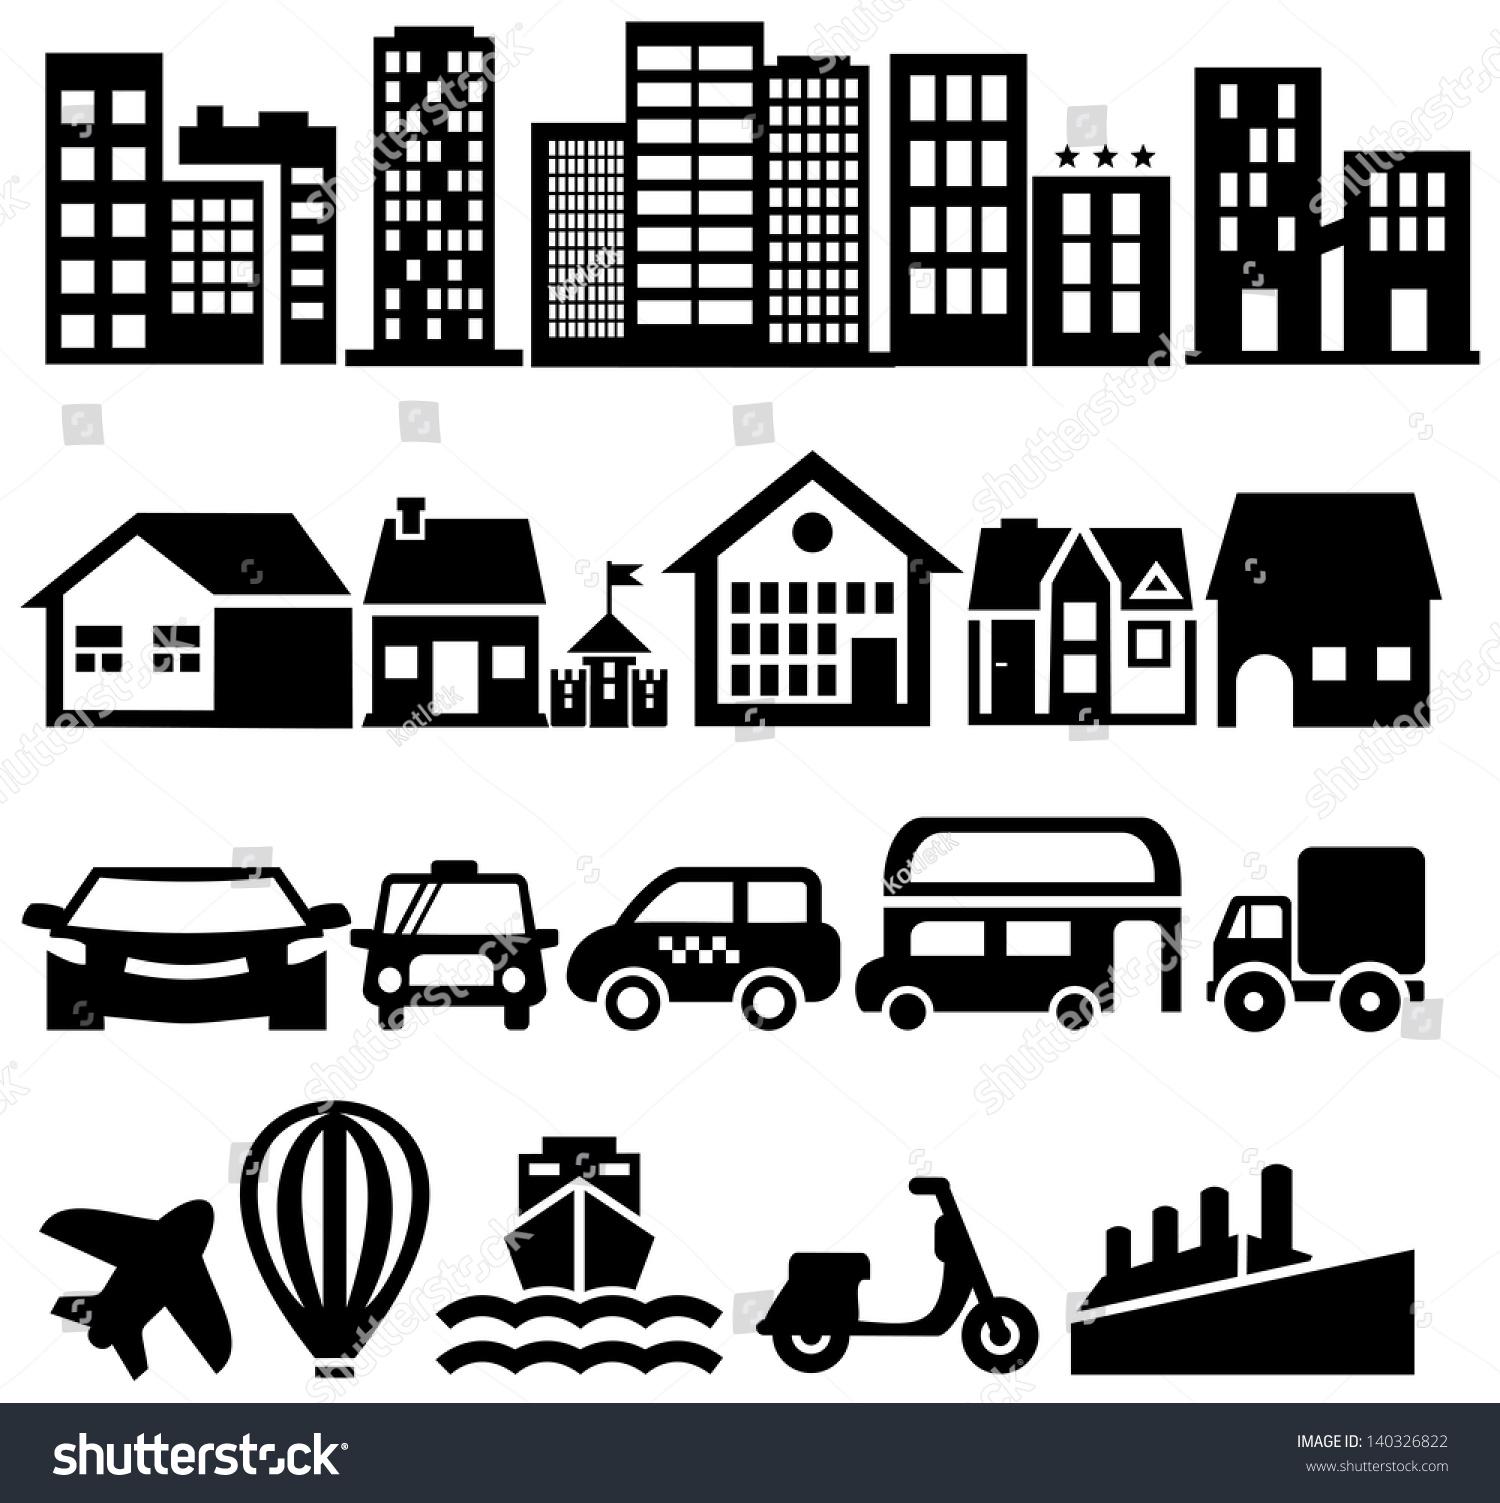 City Black Vector Icons Stock Vector 140326822 - Shutterstock